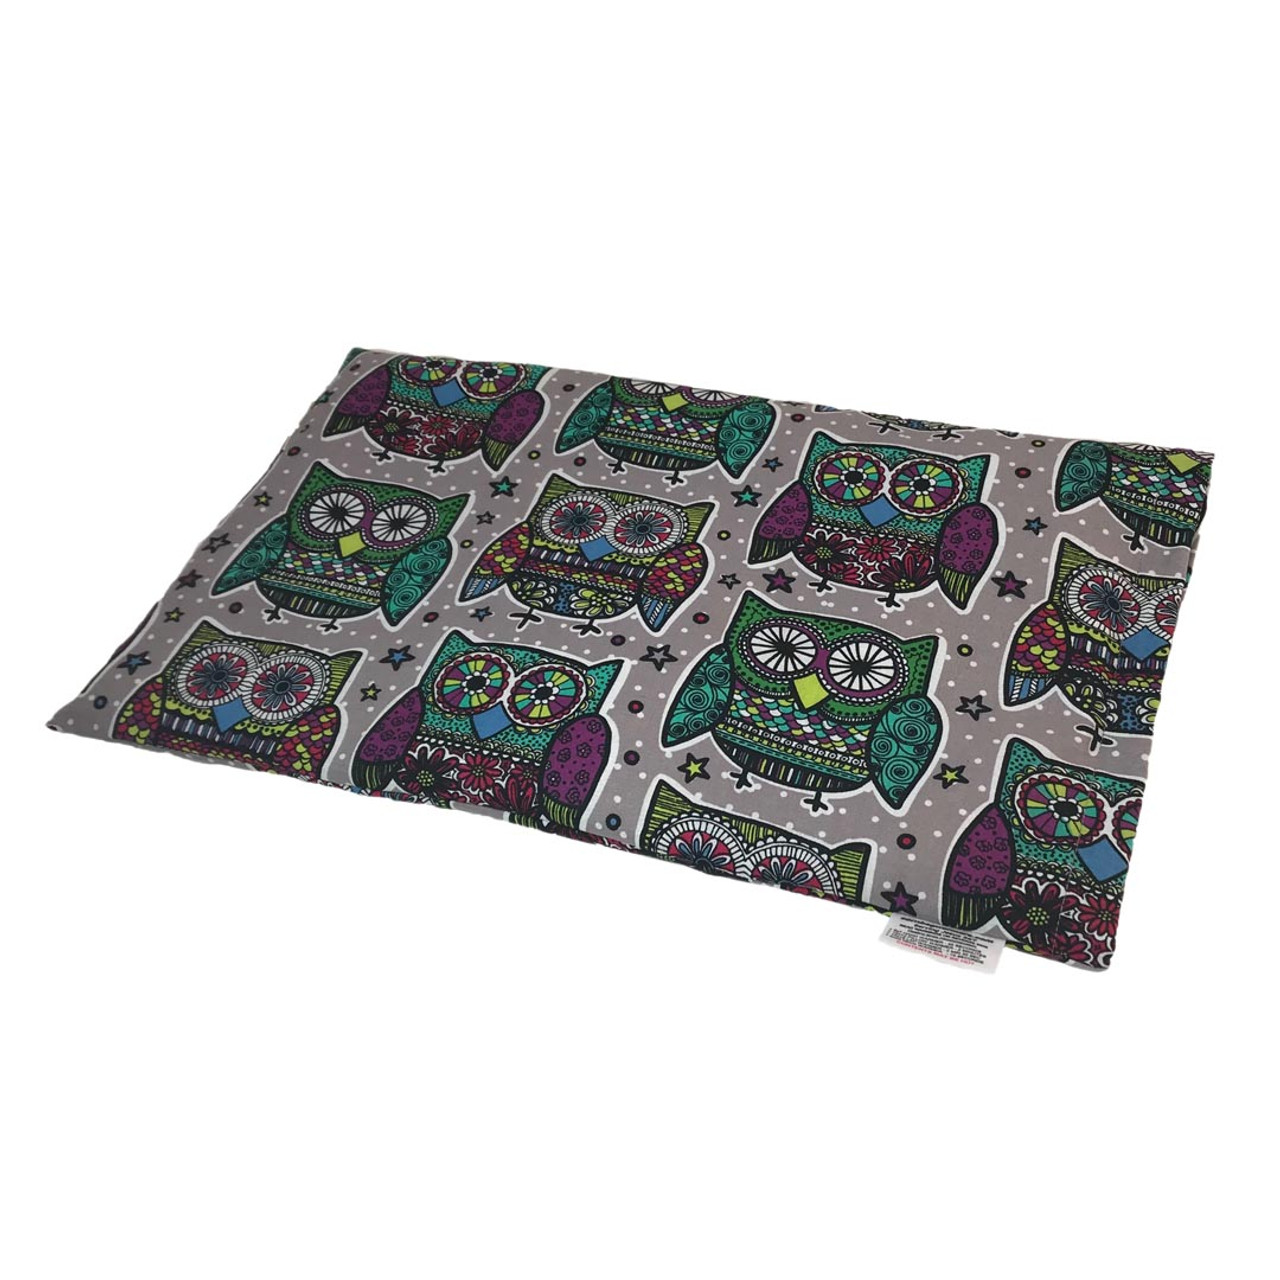 Kaleidoscope Owls Lap Microwaveable Corn Heating Pad